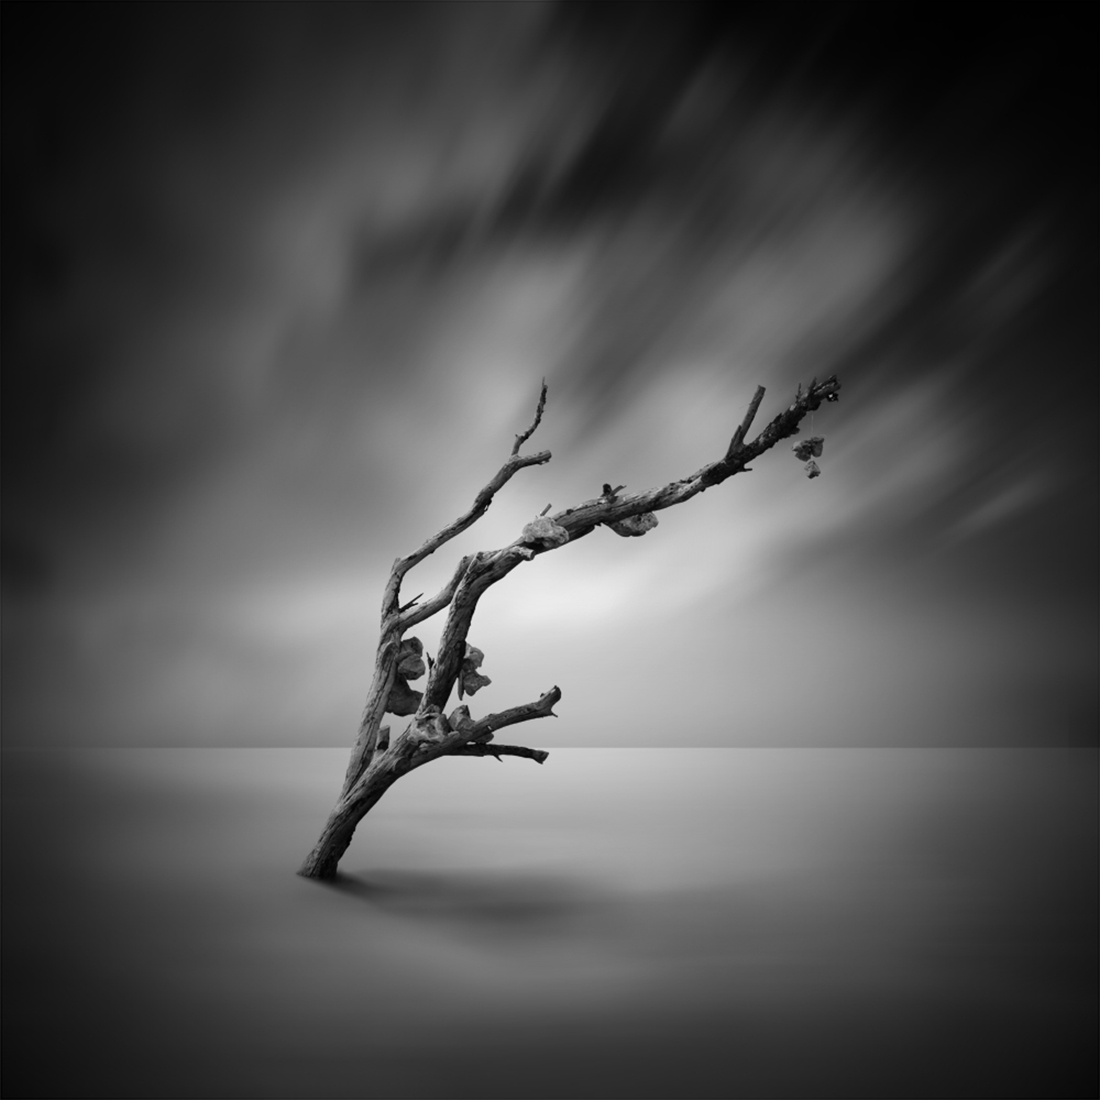 Tree of life by Hasibe Borhani (10).jpg